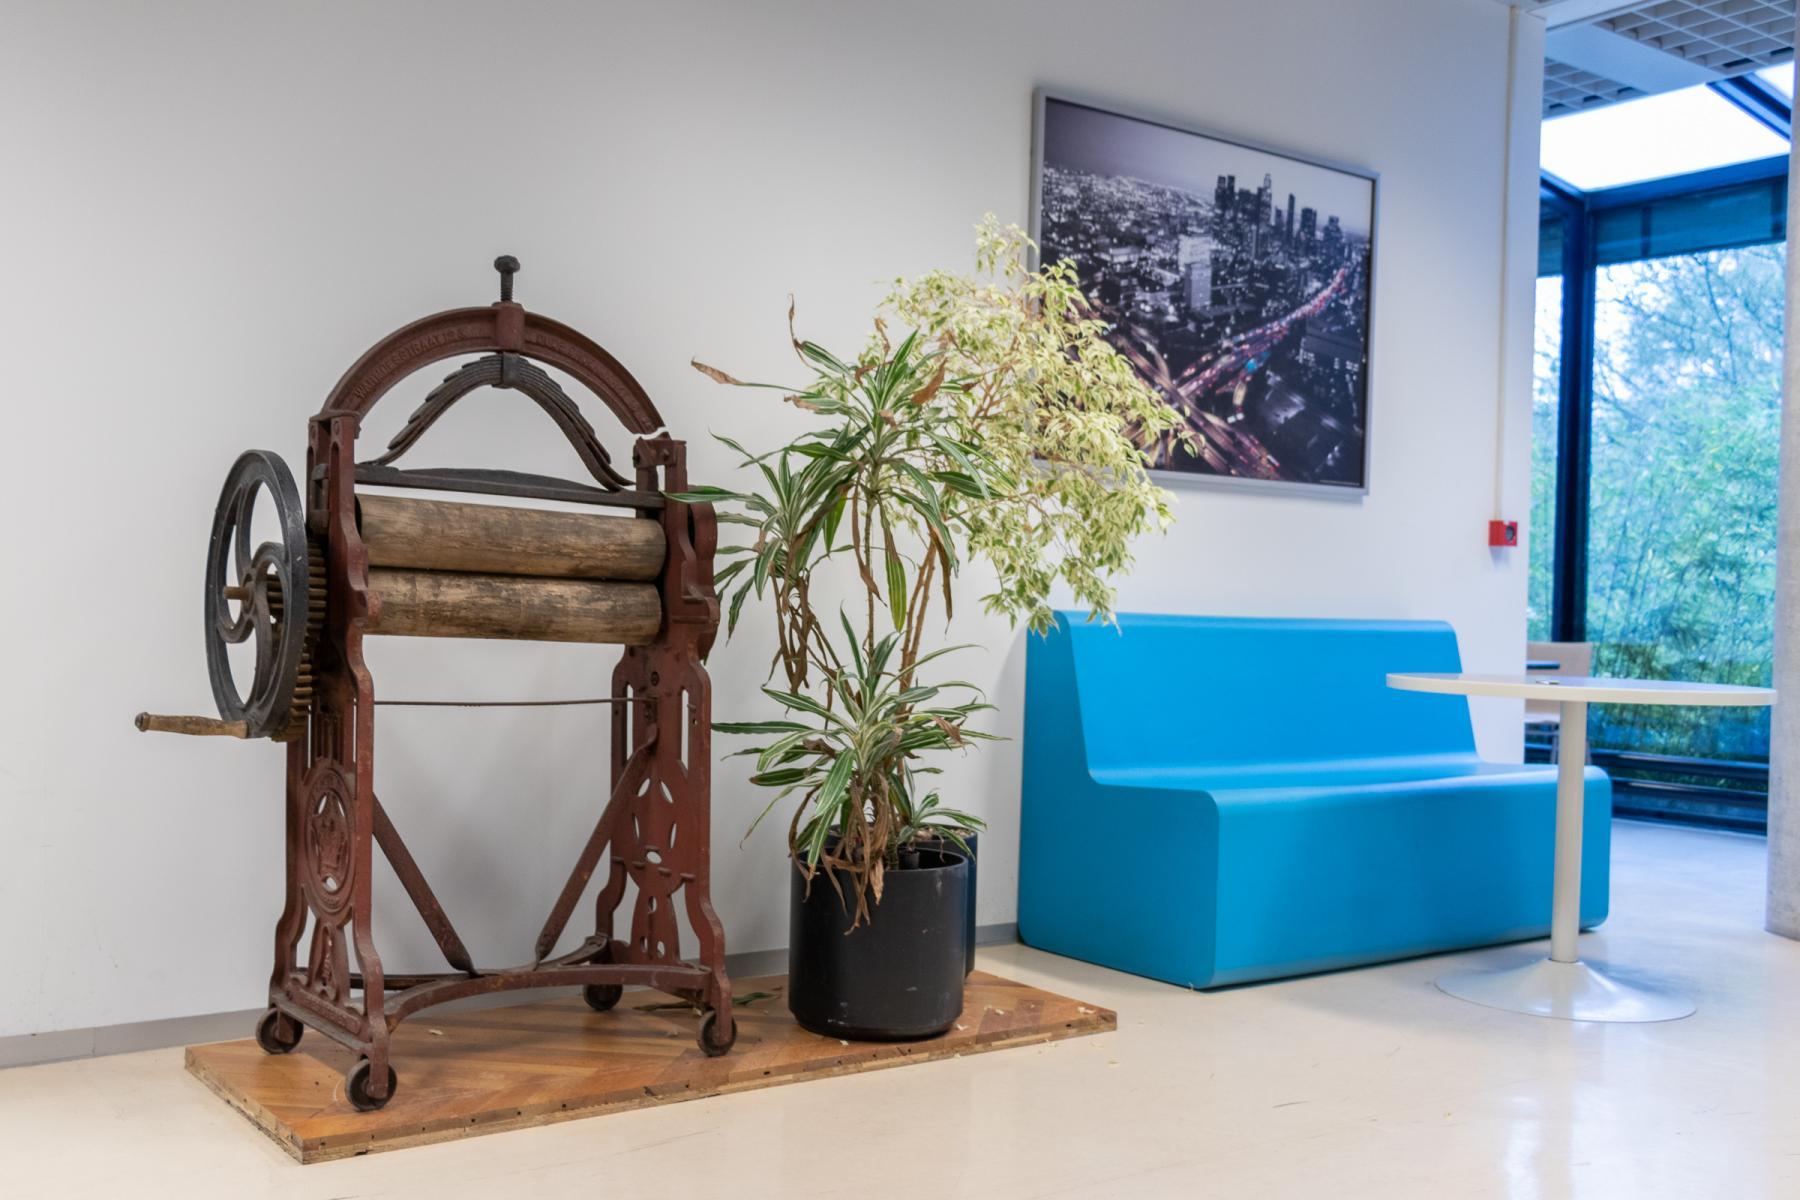 Rent office space Richard Holkade 14, Haarlem (1)